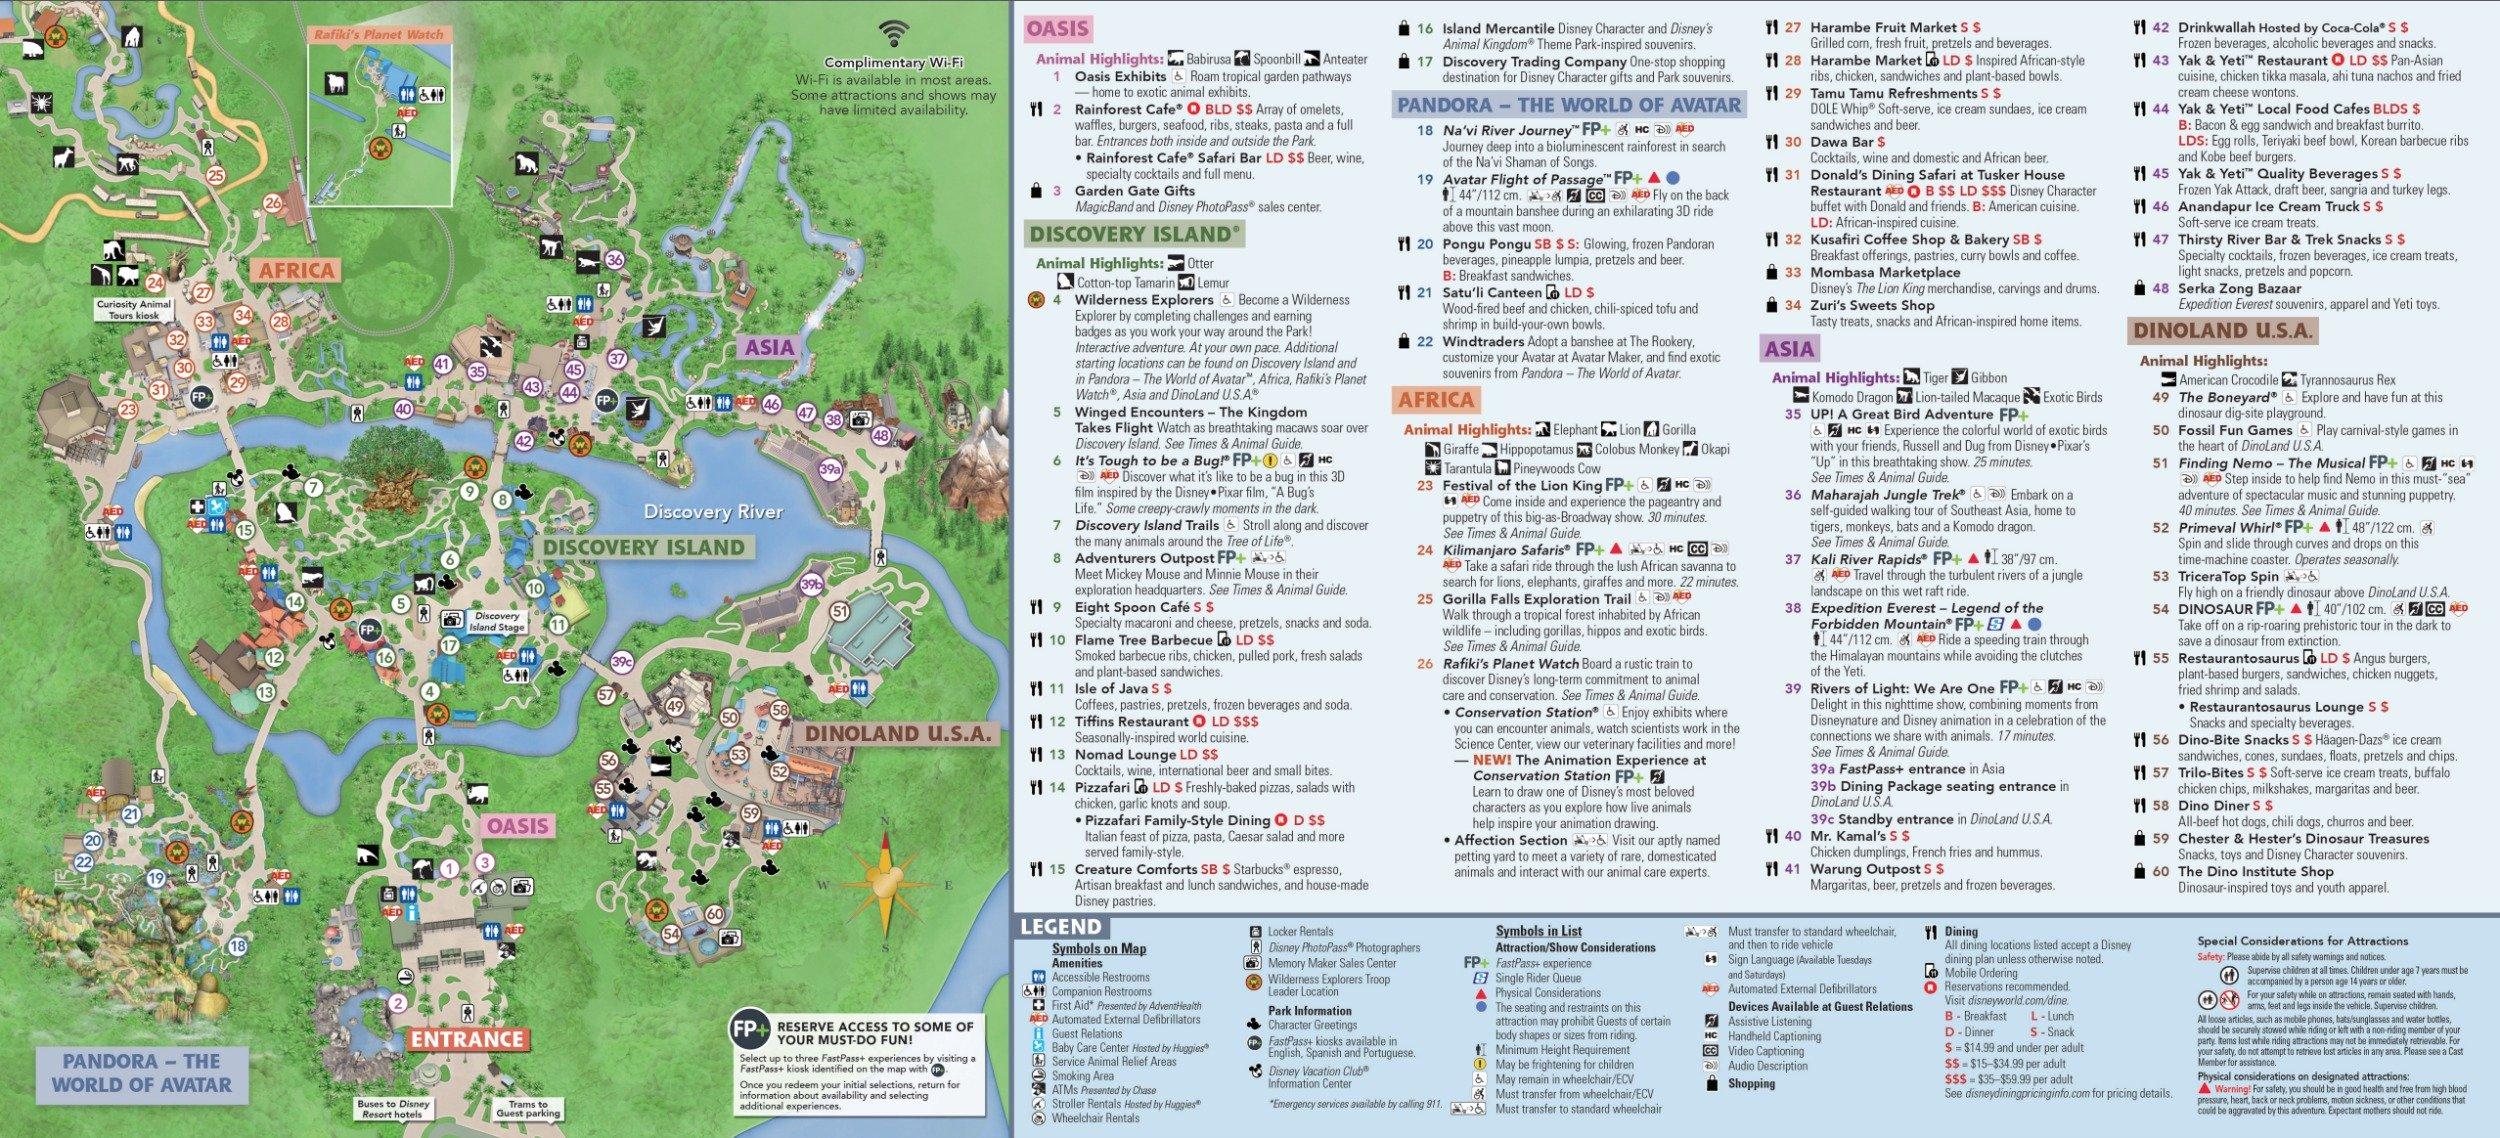 [%Disney World Map [2021 Maps: Resorts, Theme Parks, Water|Disney World Rides List 2021 Pdf|Disney World Rides List 2021 Pdf%]